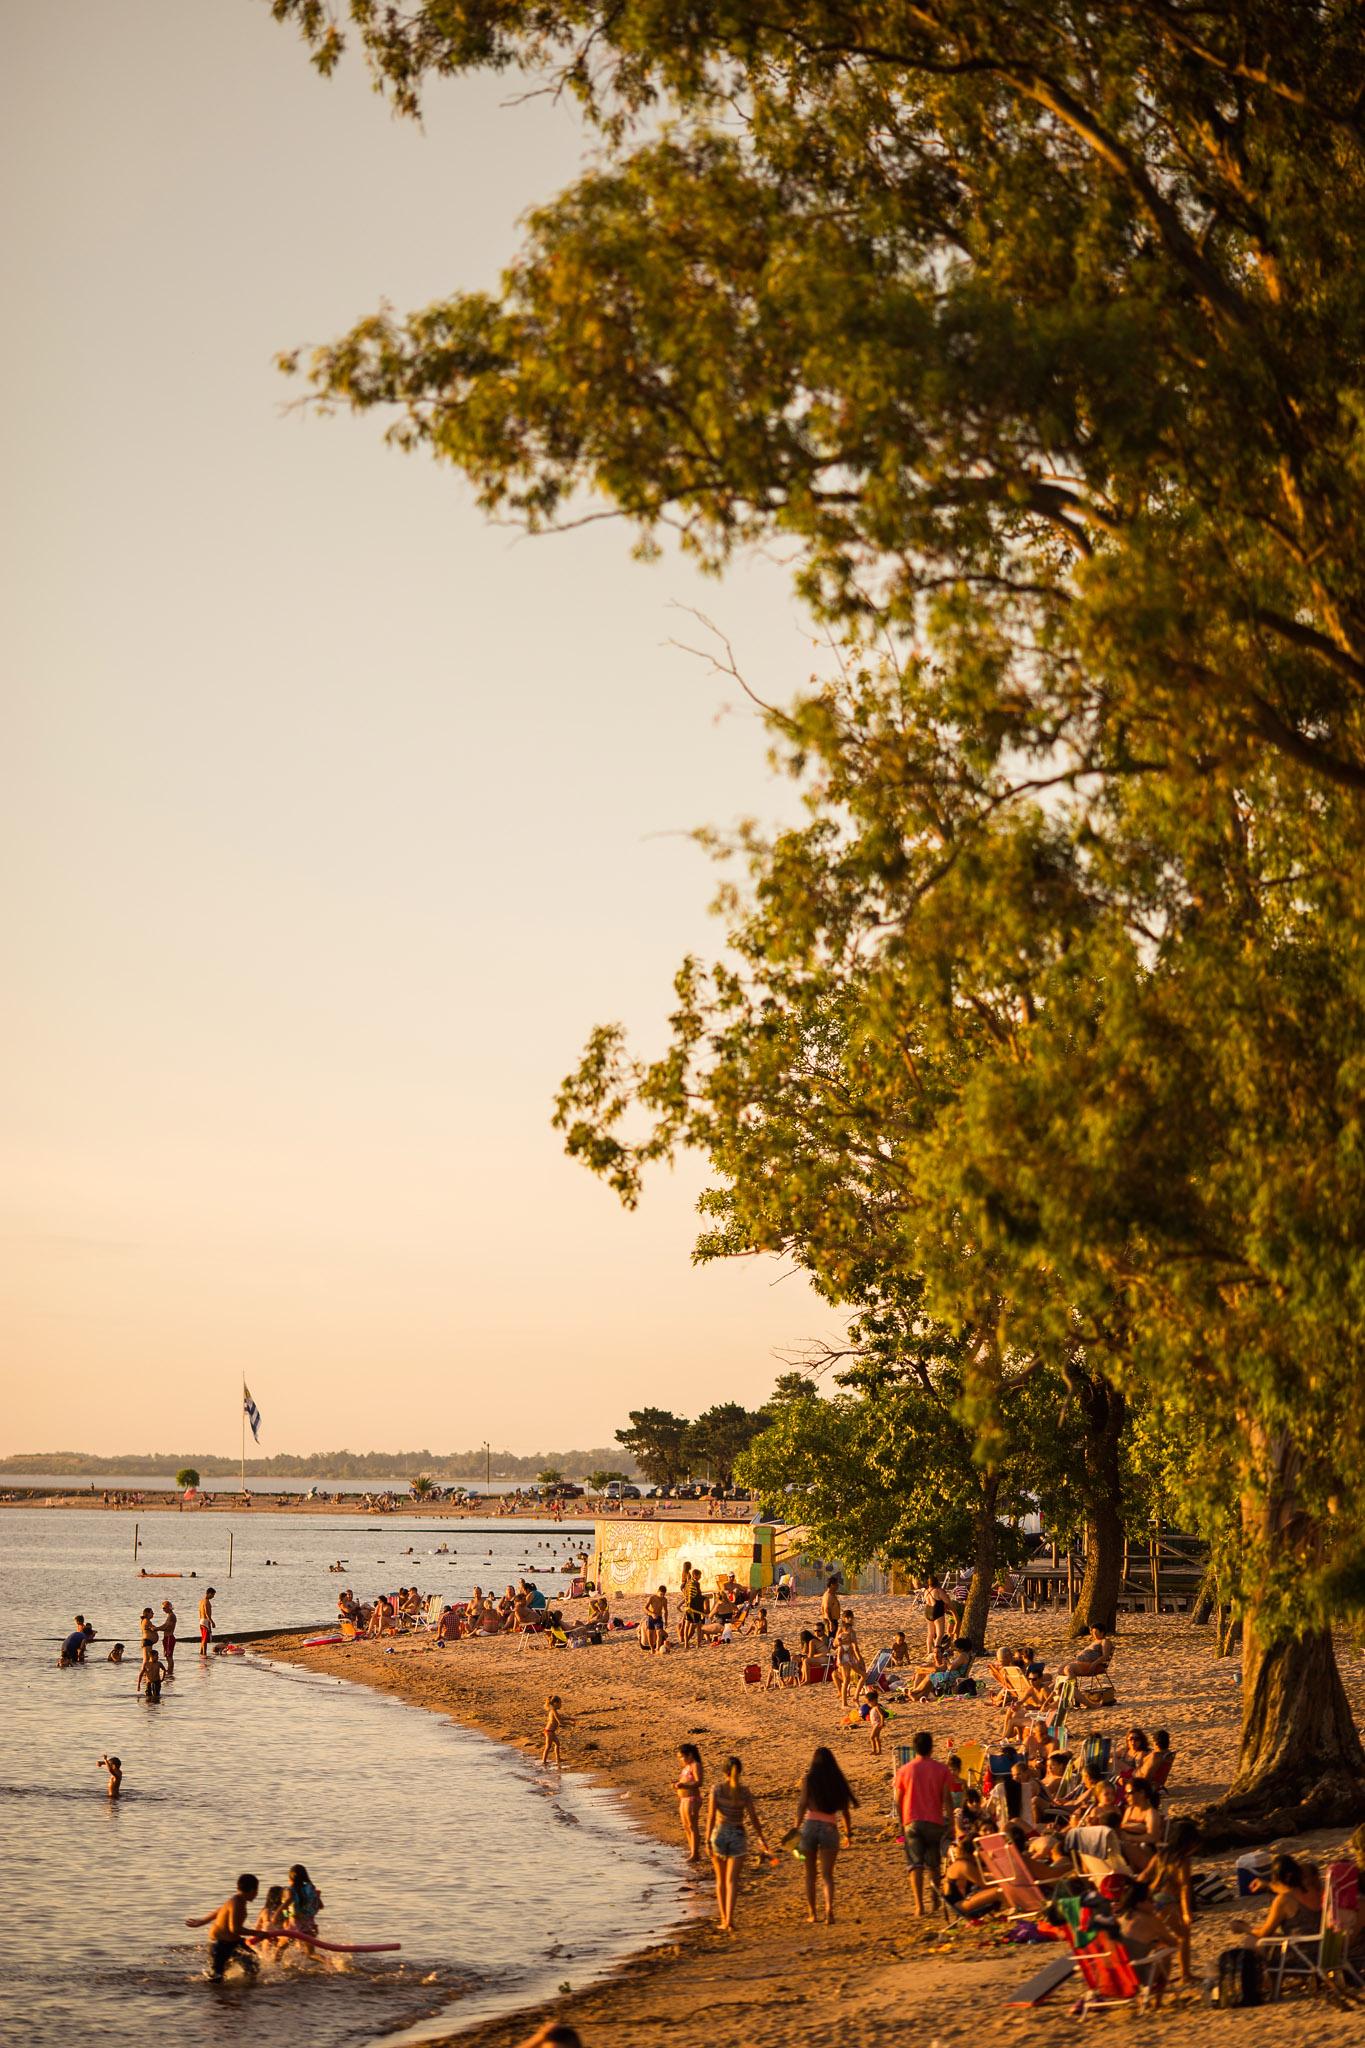 wedding-travellers-destination-photography-overlanding-south-america-uruguay-carmelo-sunset-river-beach